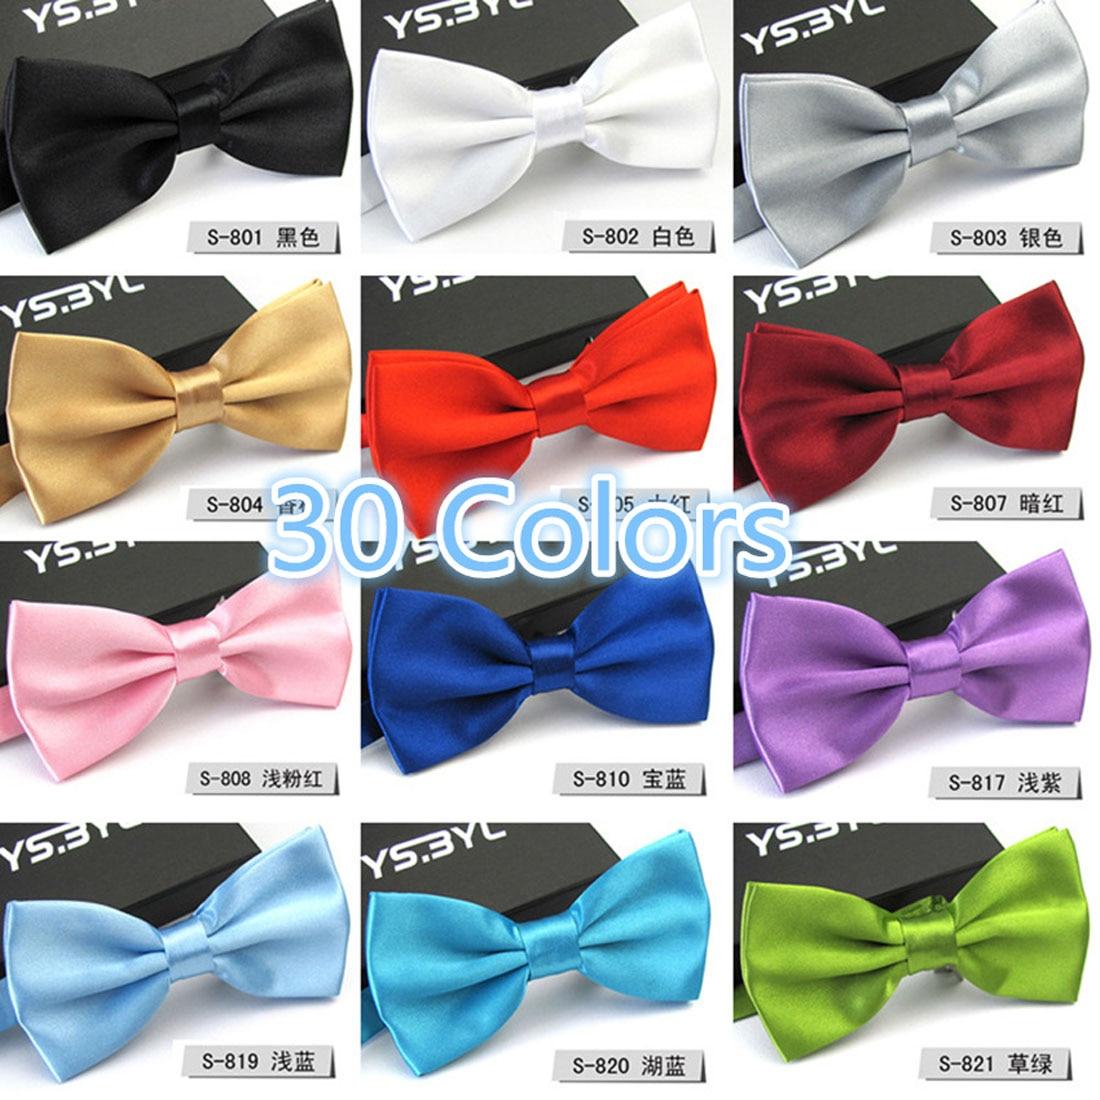 Chirstmas Gift Bowtie men formal necktie boy Men's Fashion business wedding bow tie Male Dress Shirt krawatte legame gift